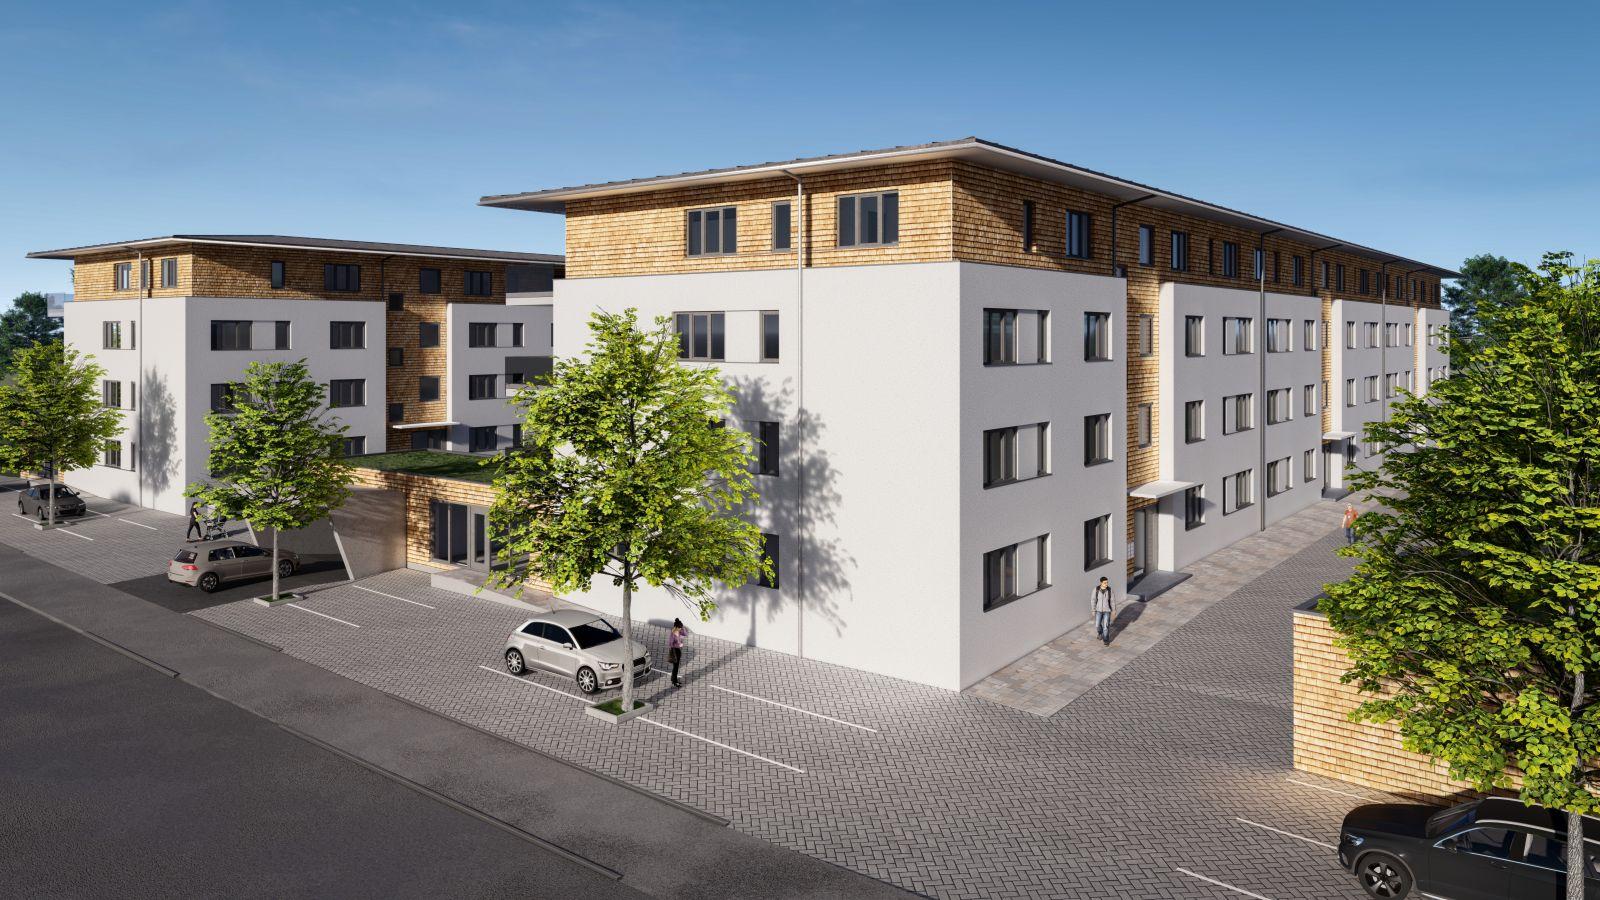 Mehrfamilienhaus-Simbach-am-Inn-03